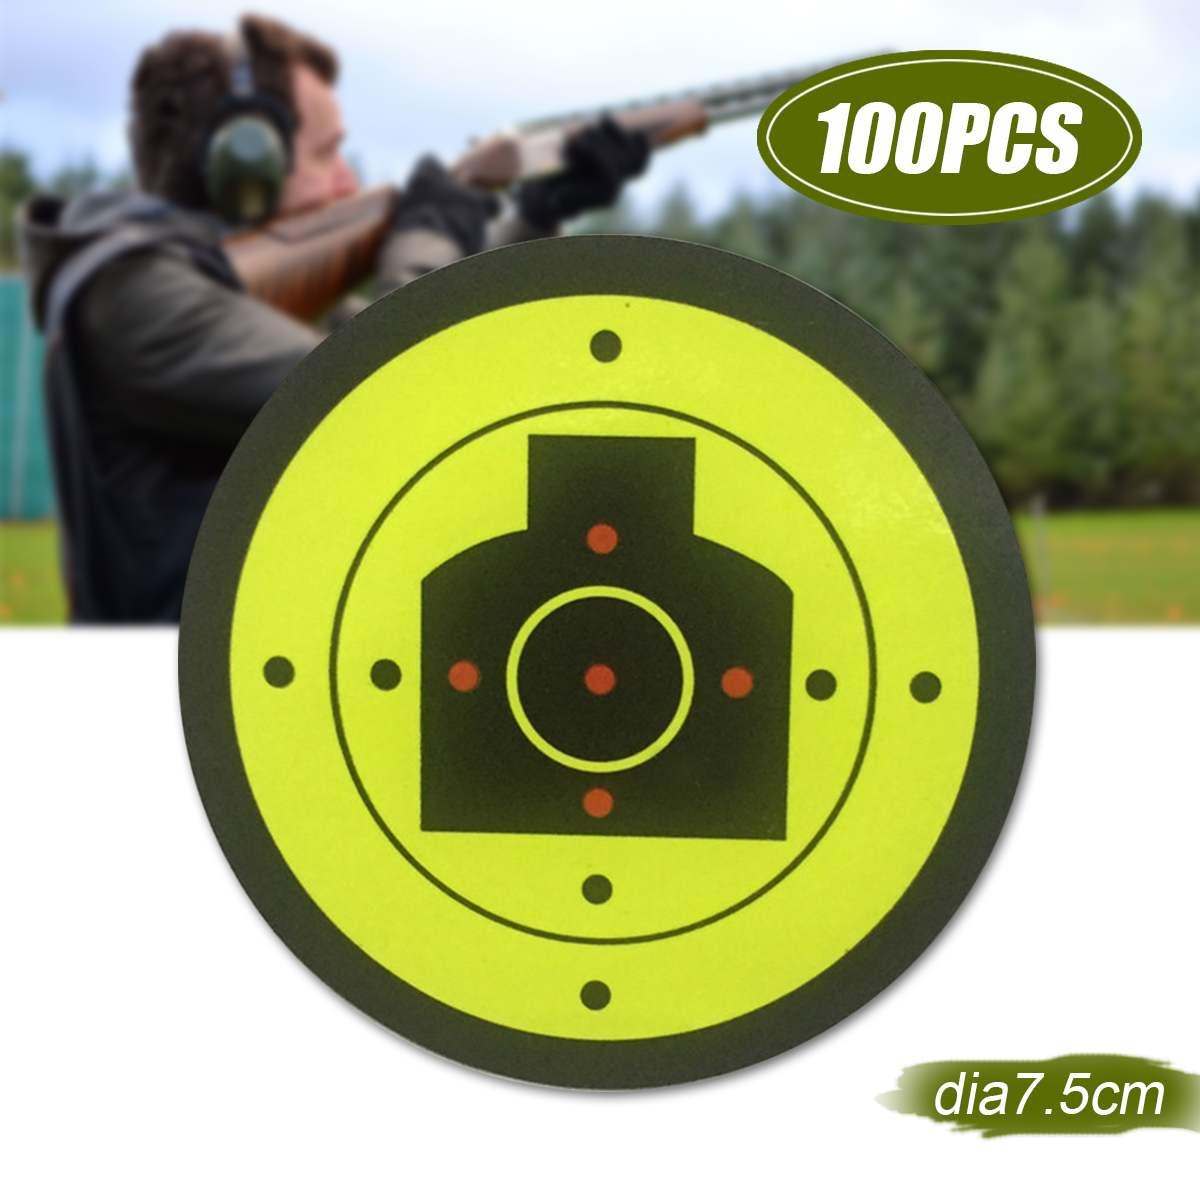 100Pcs Stick Splatter Reactive Target Sticker Self Adhesive Shooting Targets For Fluorescent Hunting Guns Target Paper Dia 7.5cm